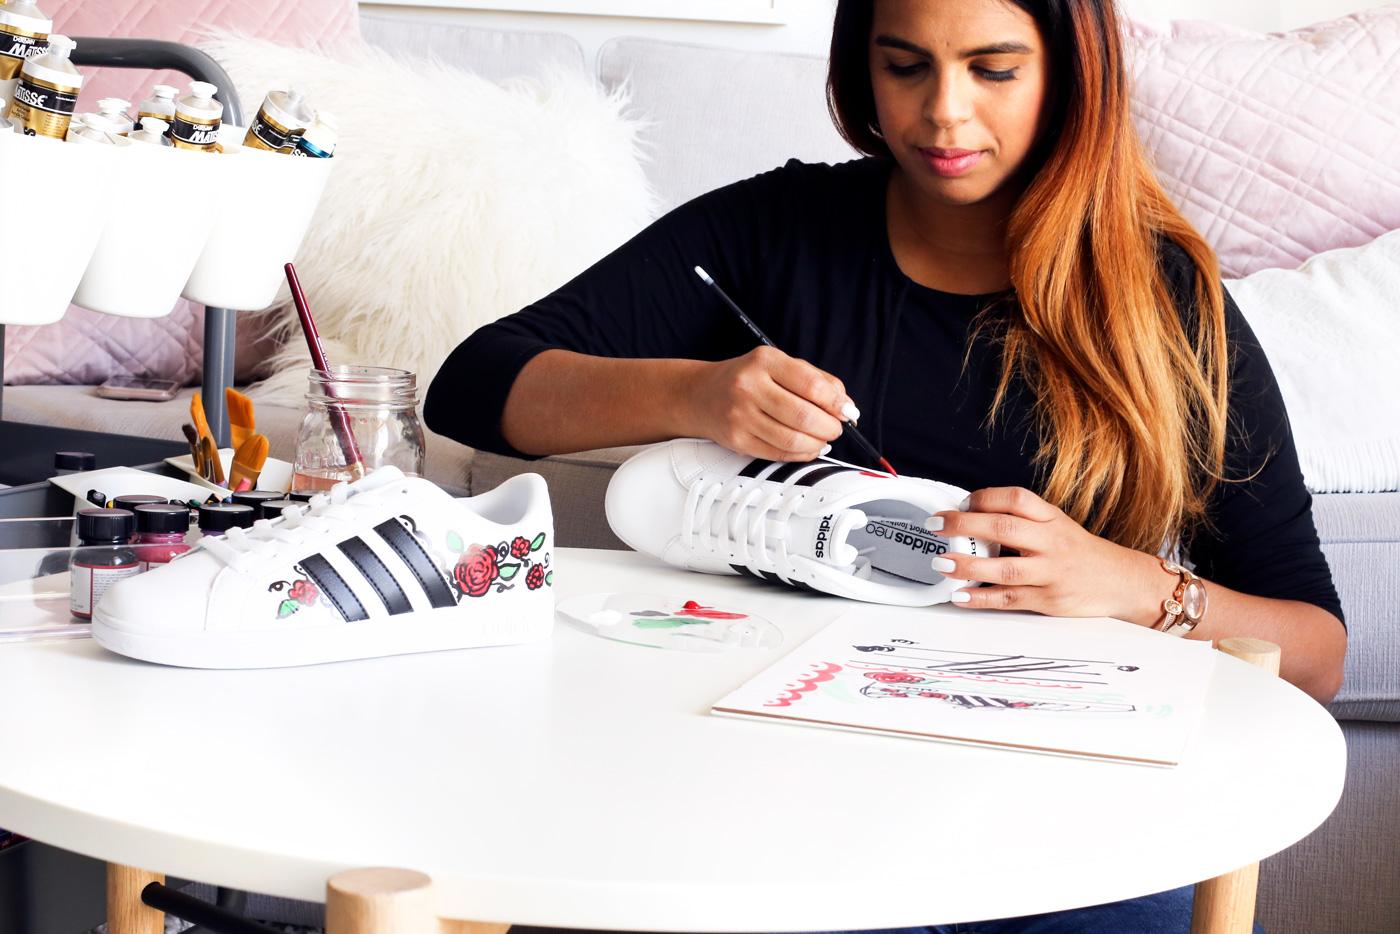 TAOS-Famous-Footwear-Stepforward-Adidas-3